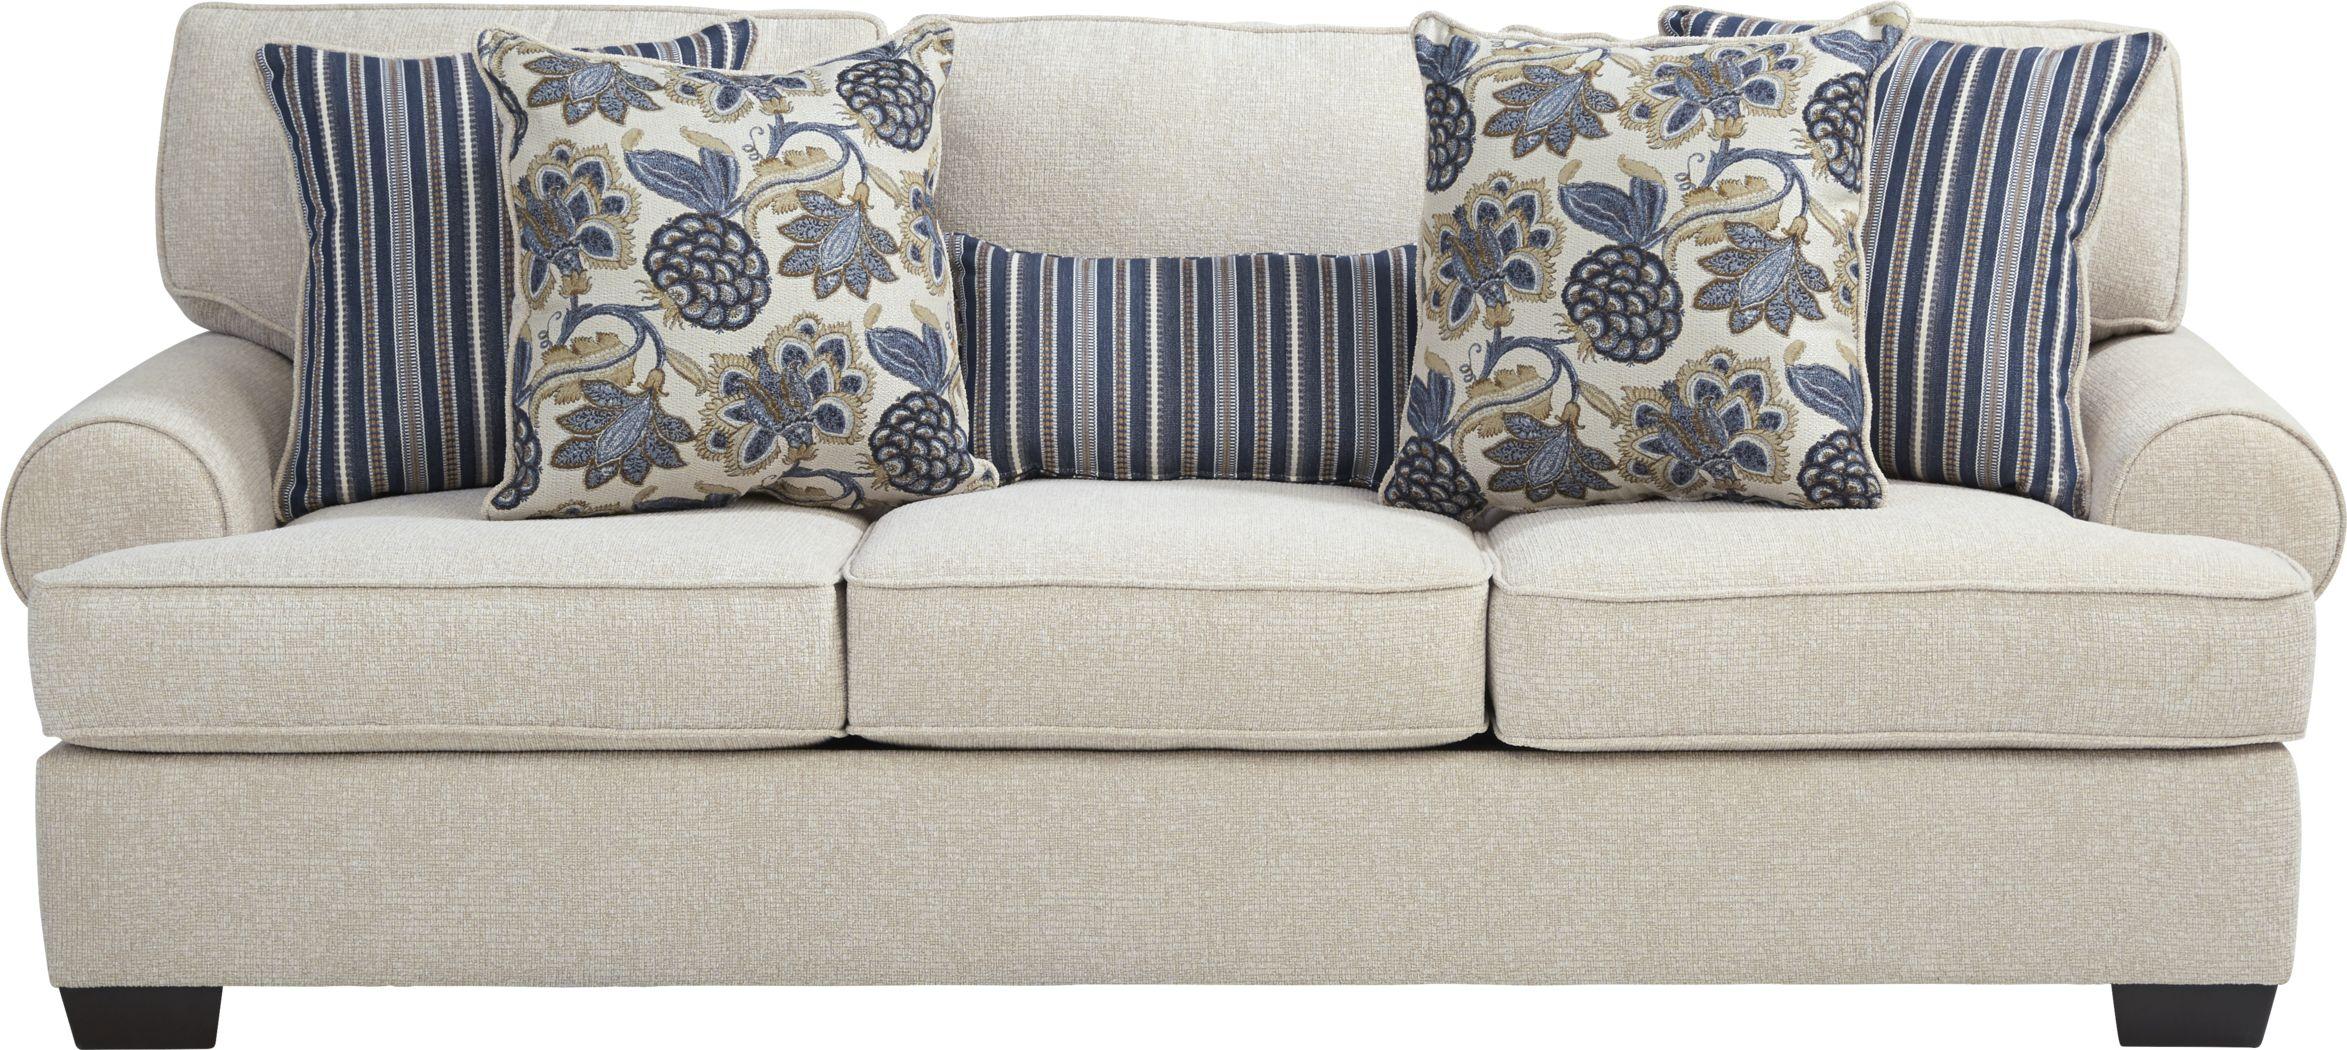 Highland Lakes Beige Sofa